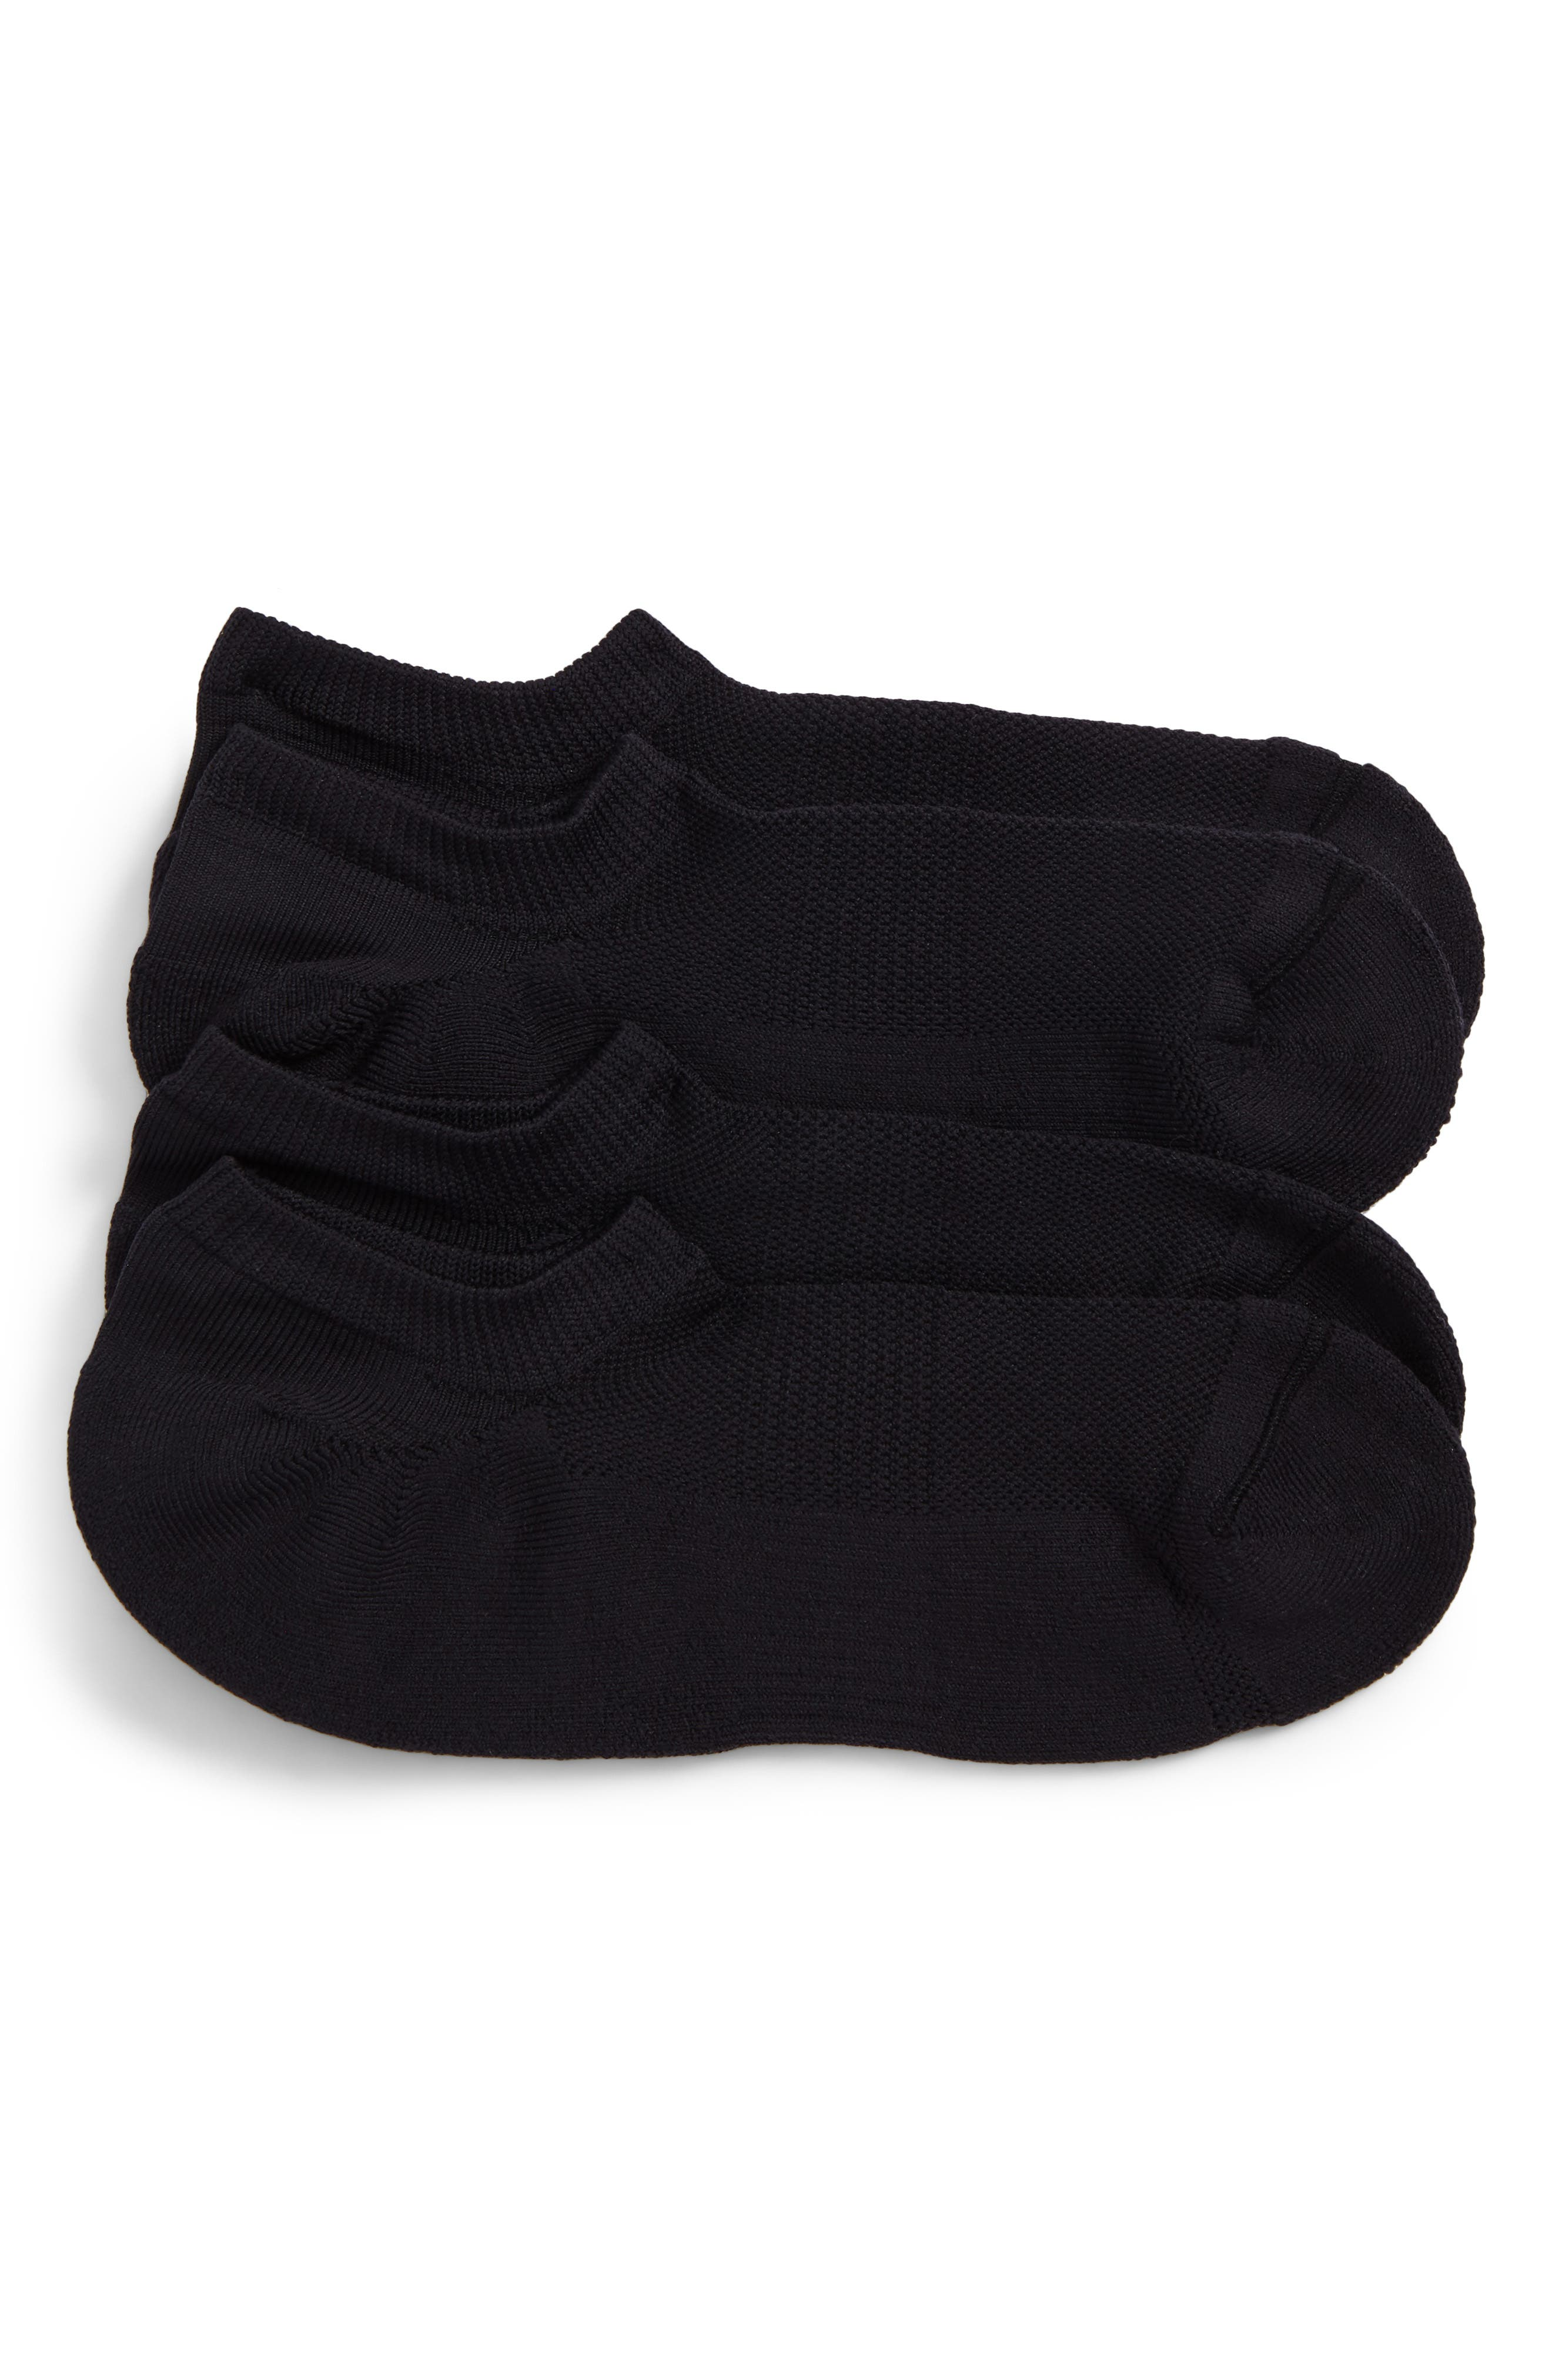 Tech-Smart 2-Pack No-Show Socks,                         Main,                         color,